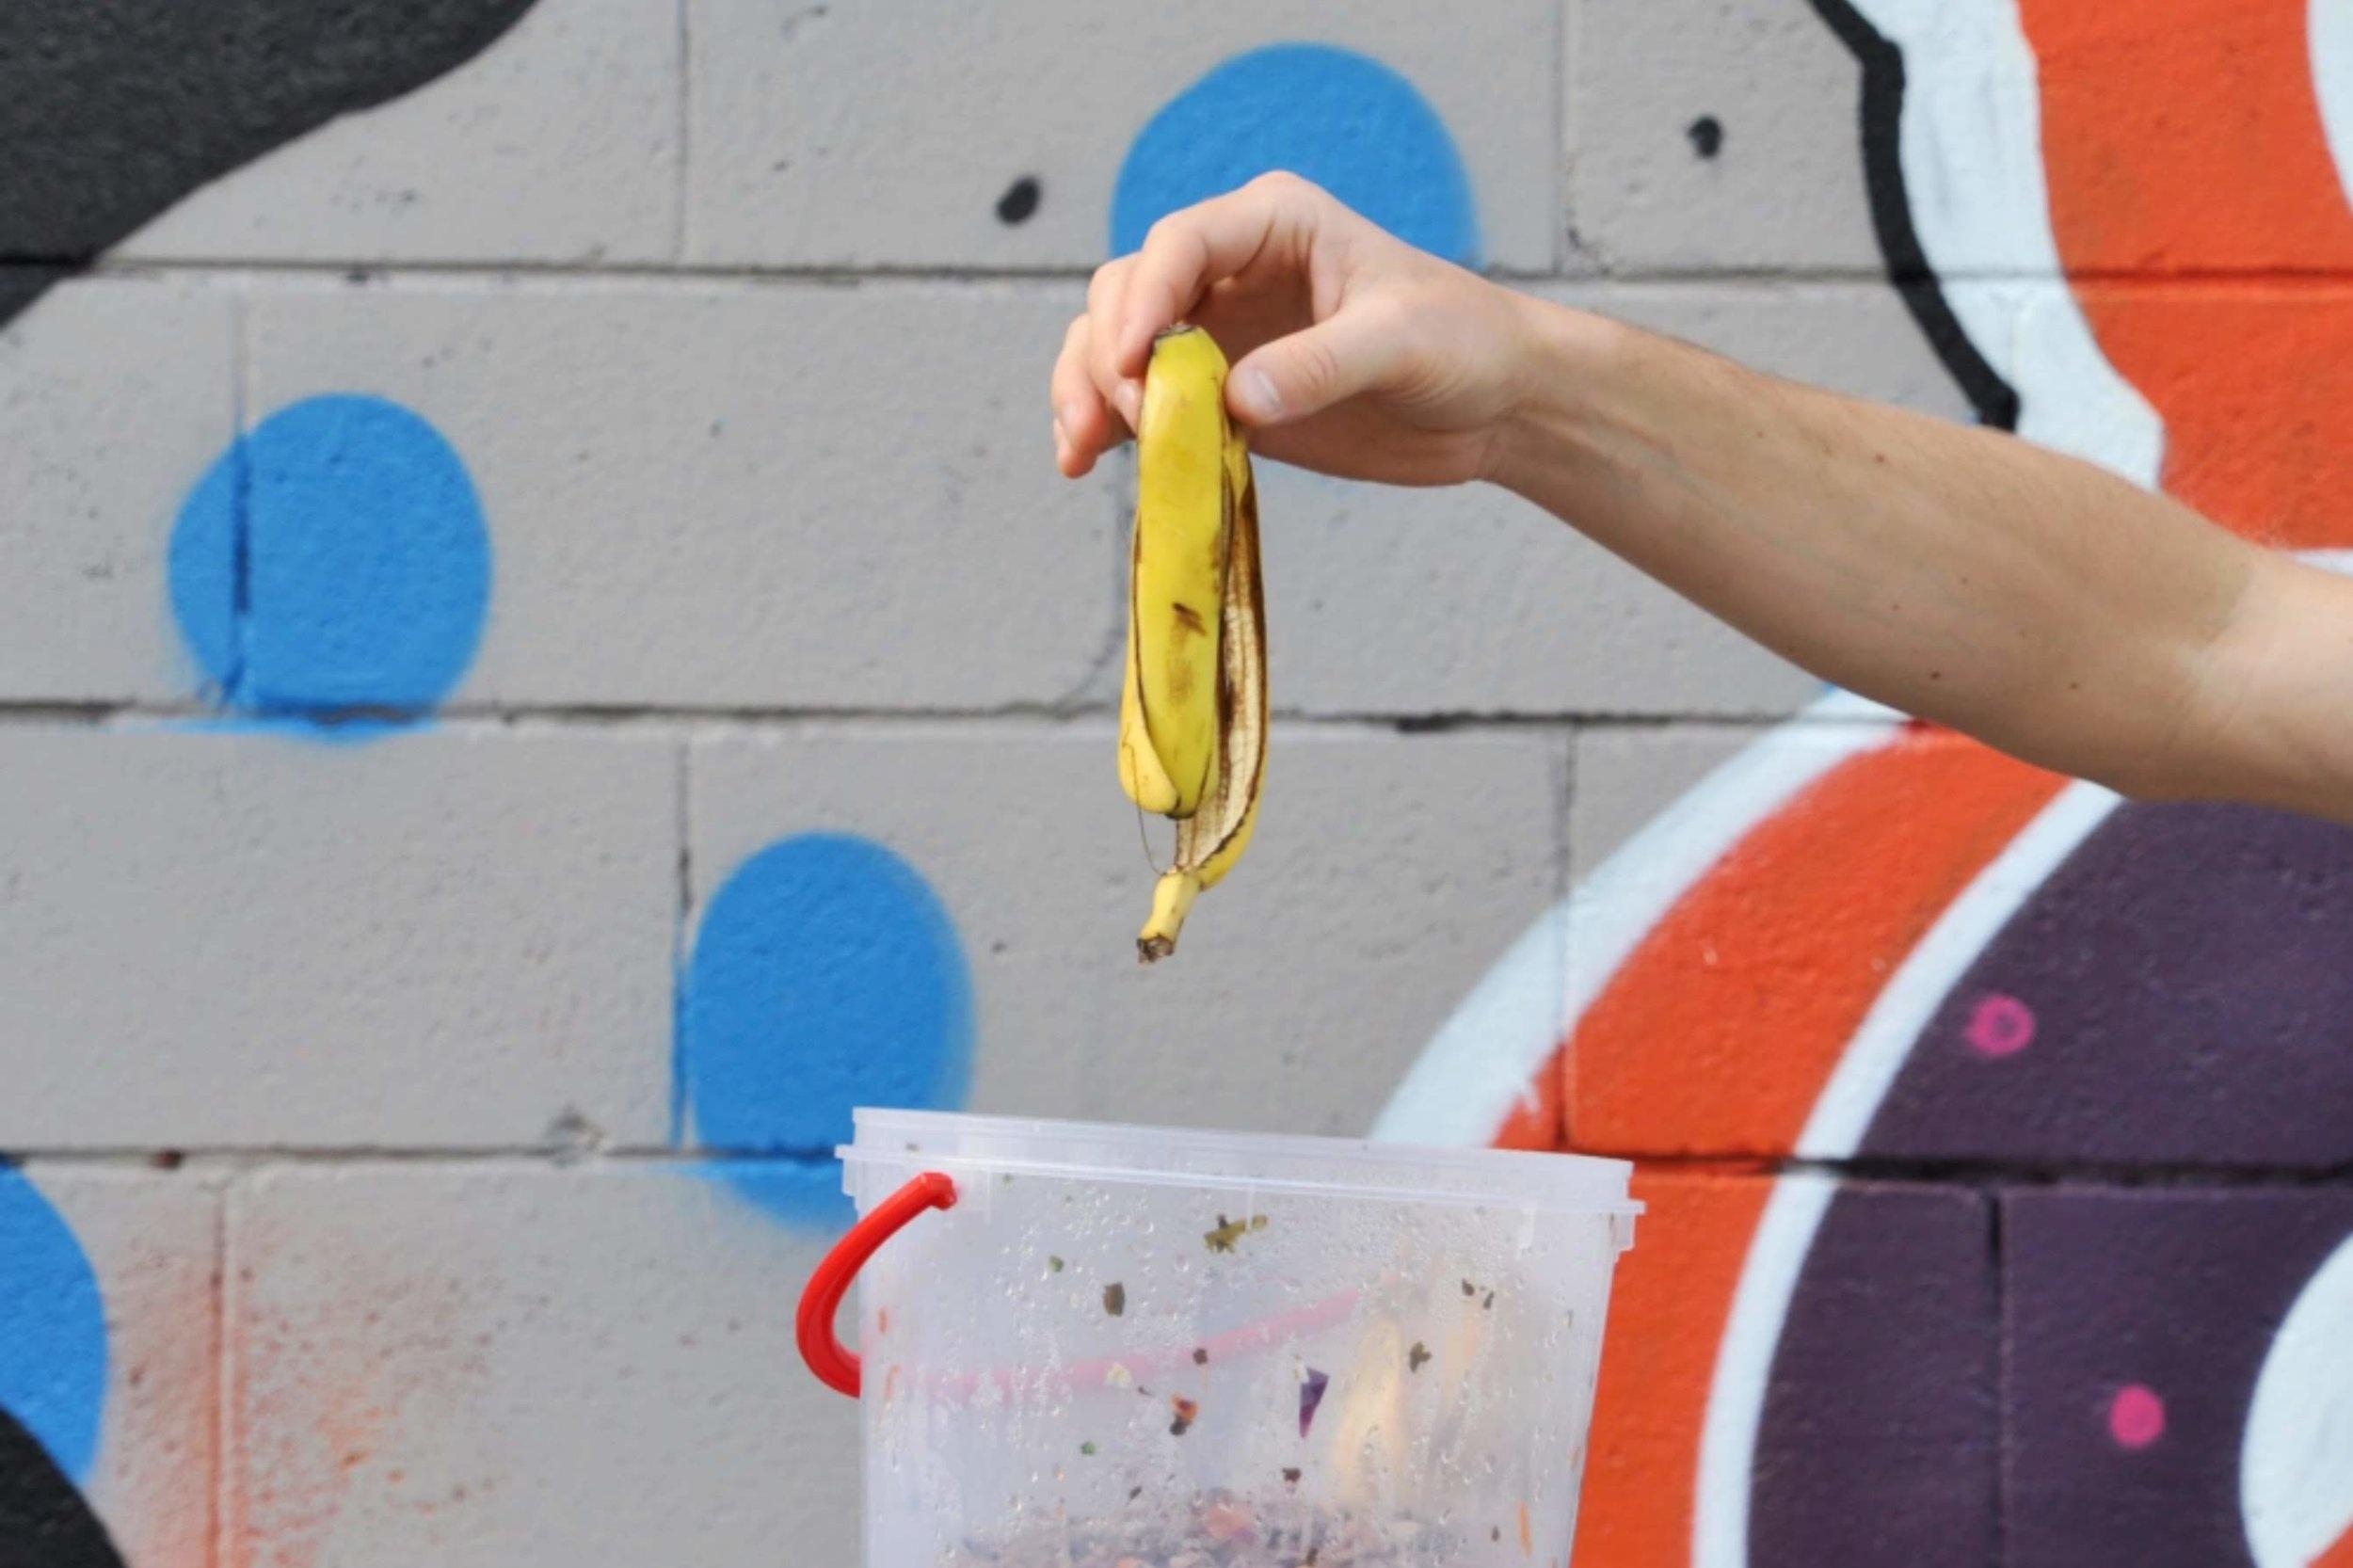 WEEK FOUR CHALLENGE: Start composting your food scraps